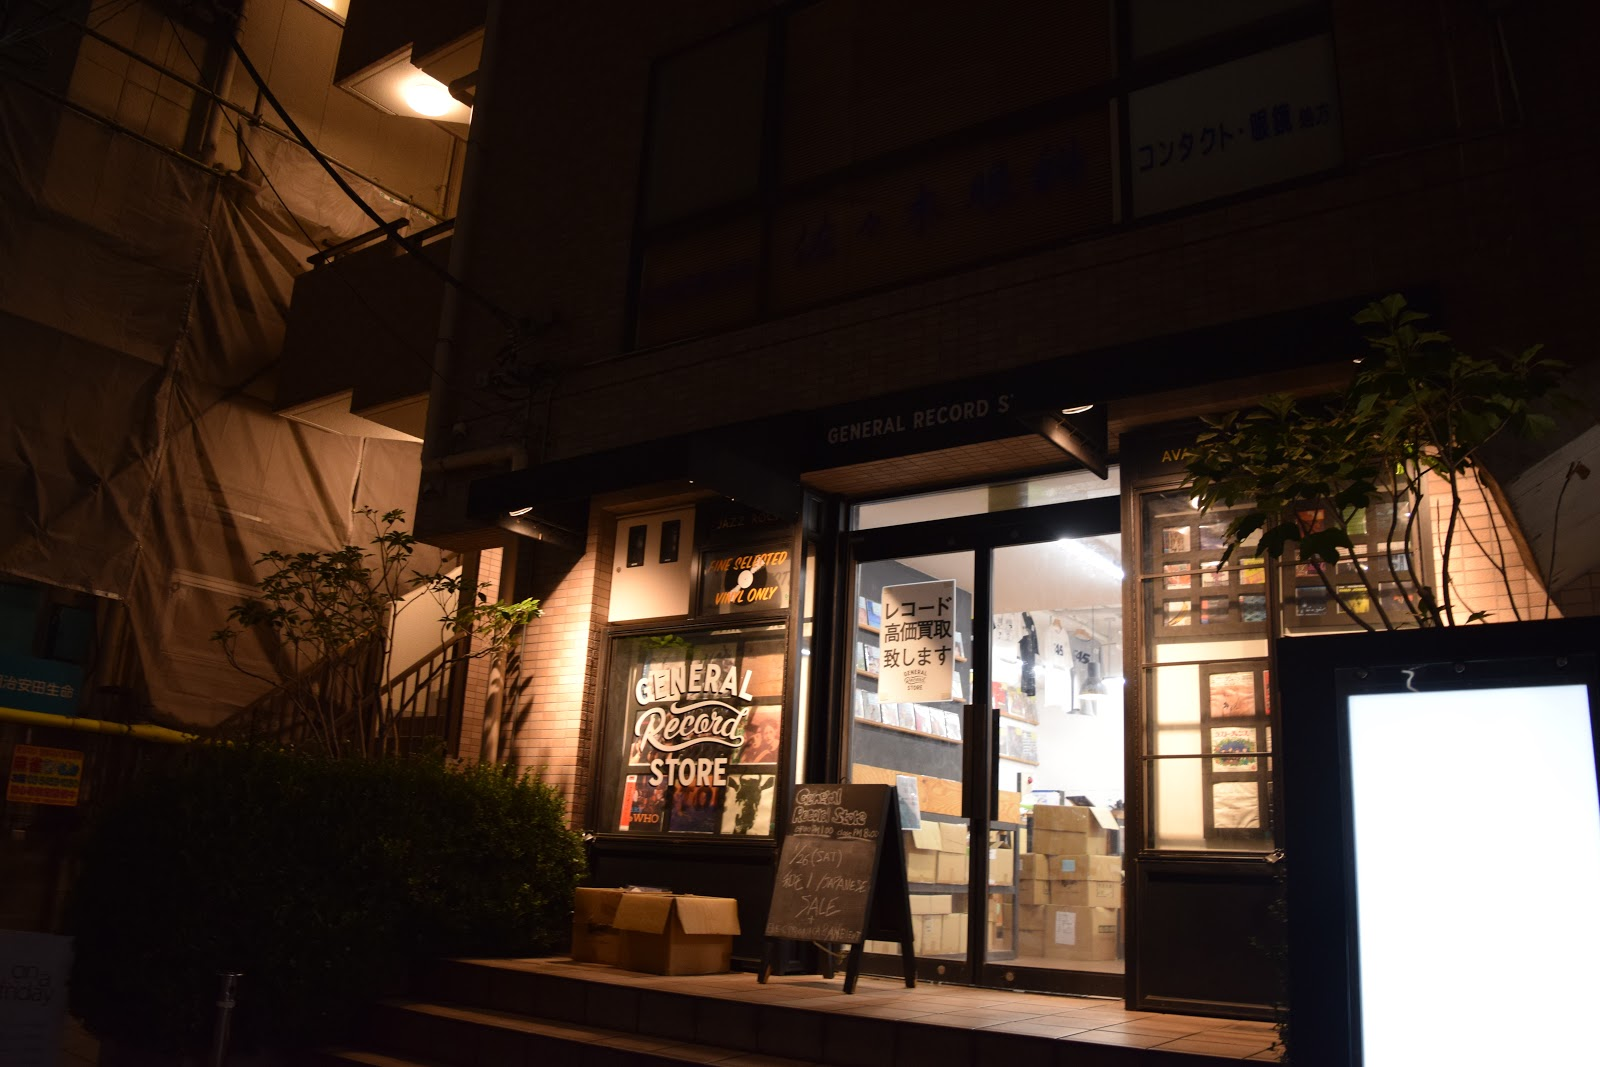 General record store in Shimokitazawa Tokyo